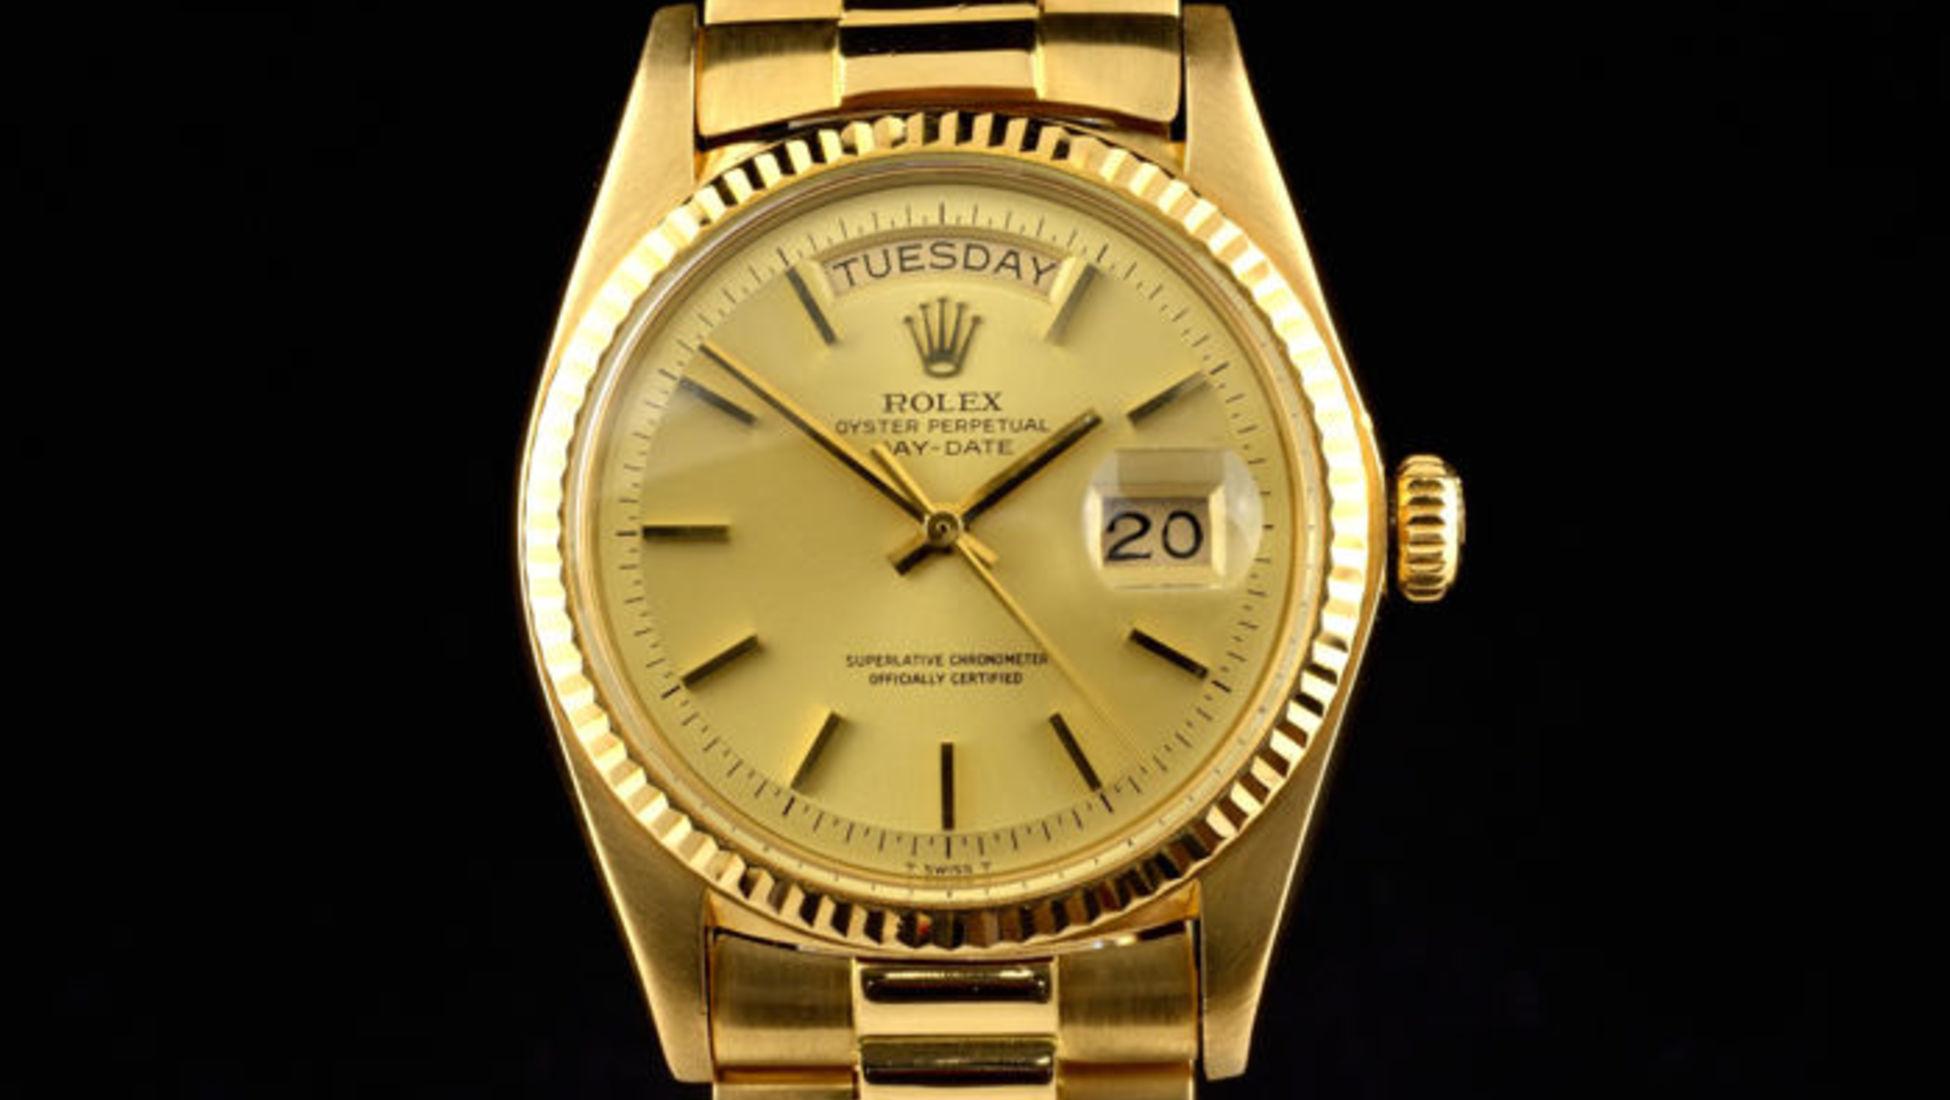 Invertir Cómo En Relojes Rolex Catawiki EWH2IeD9Y